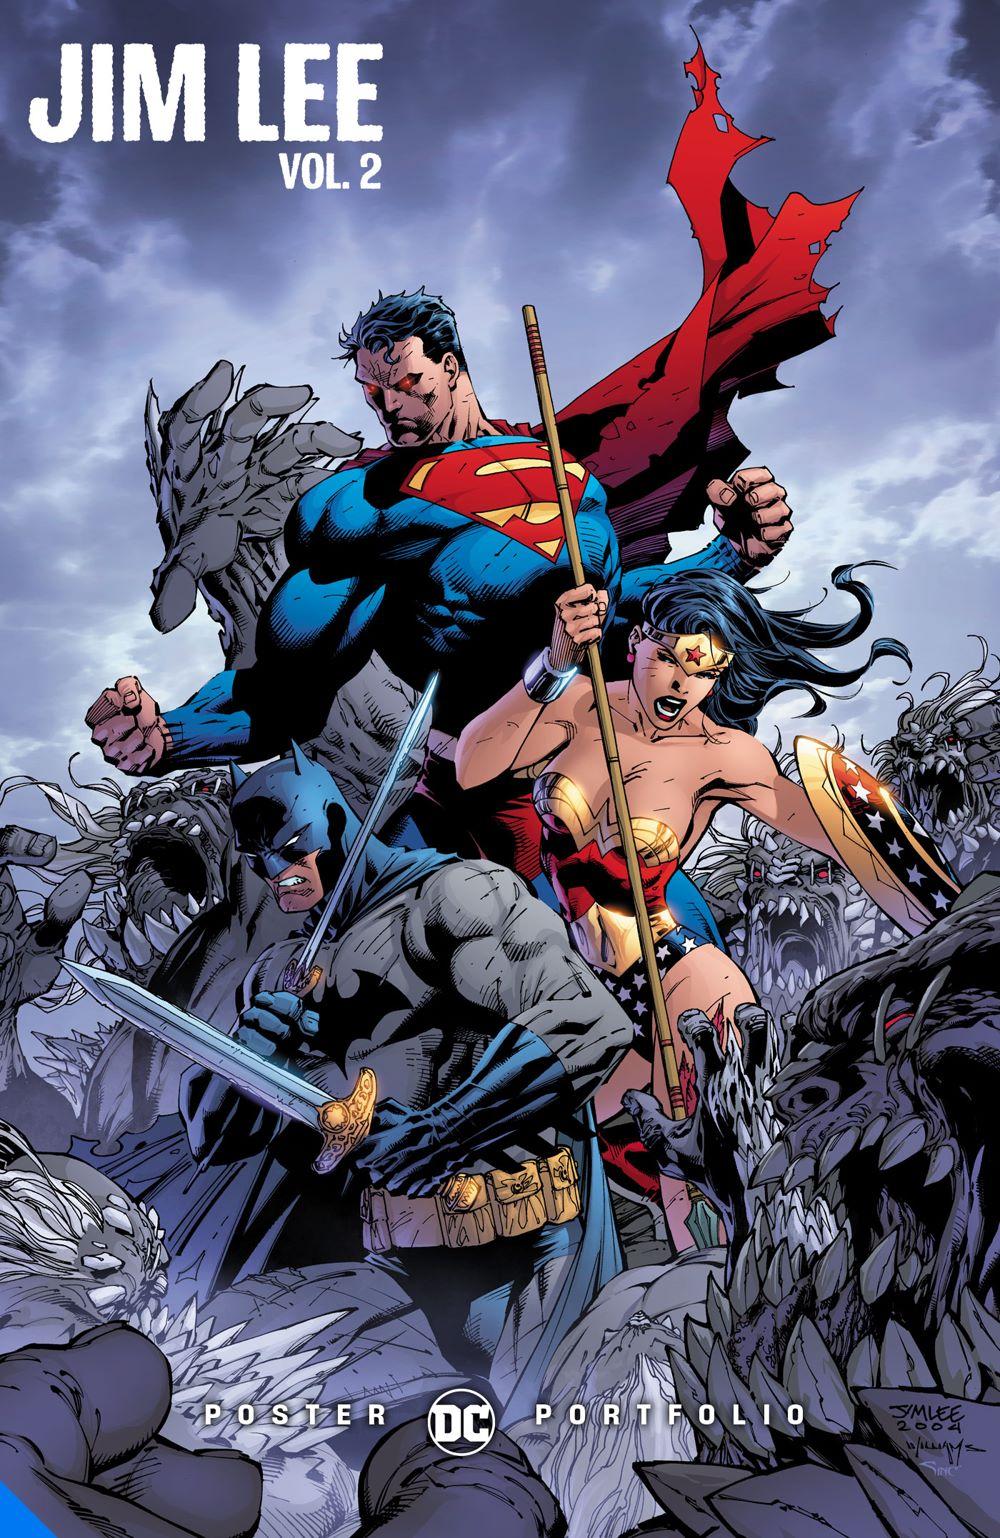 dcposterportfoliojimlee-vol2_adv DC Comics July 2021 Solicitations